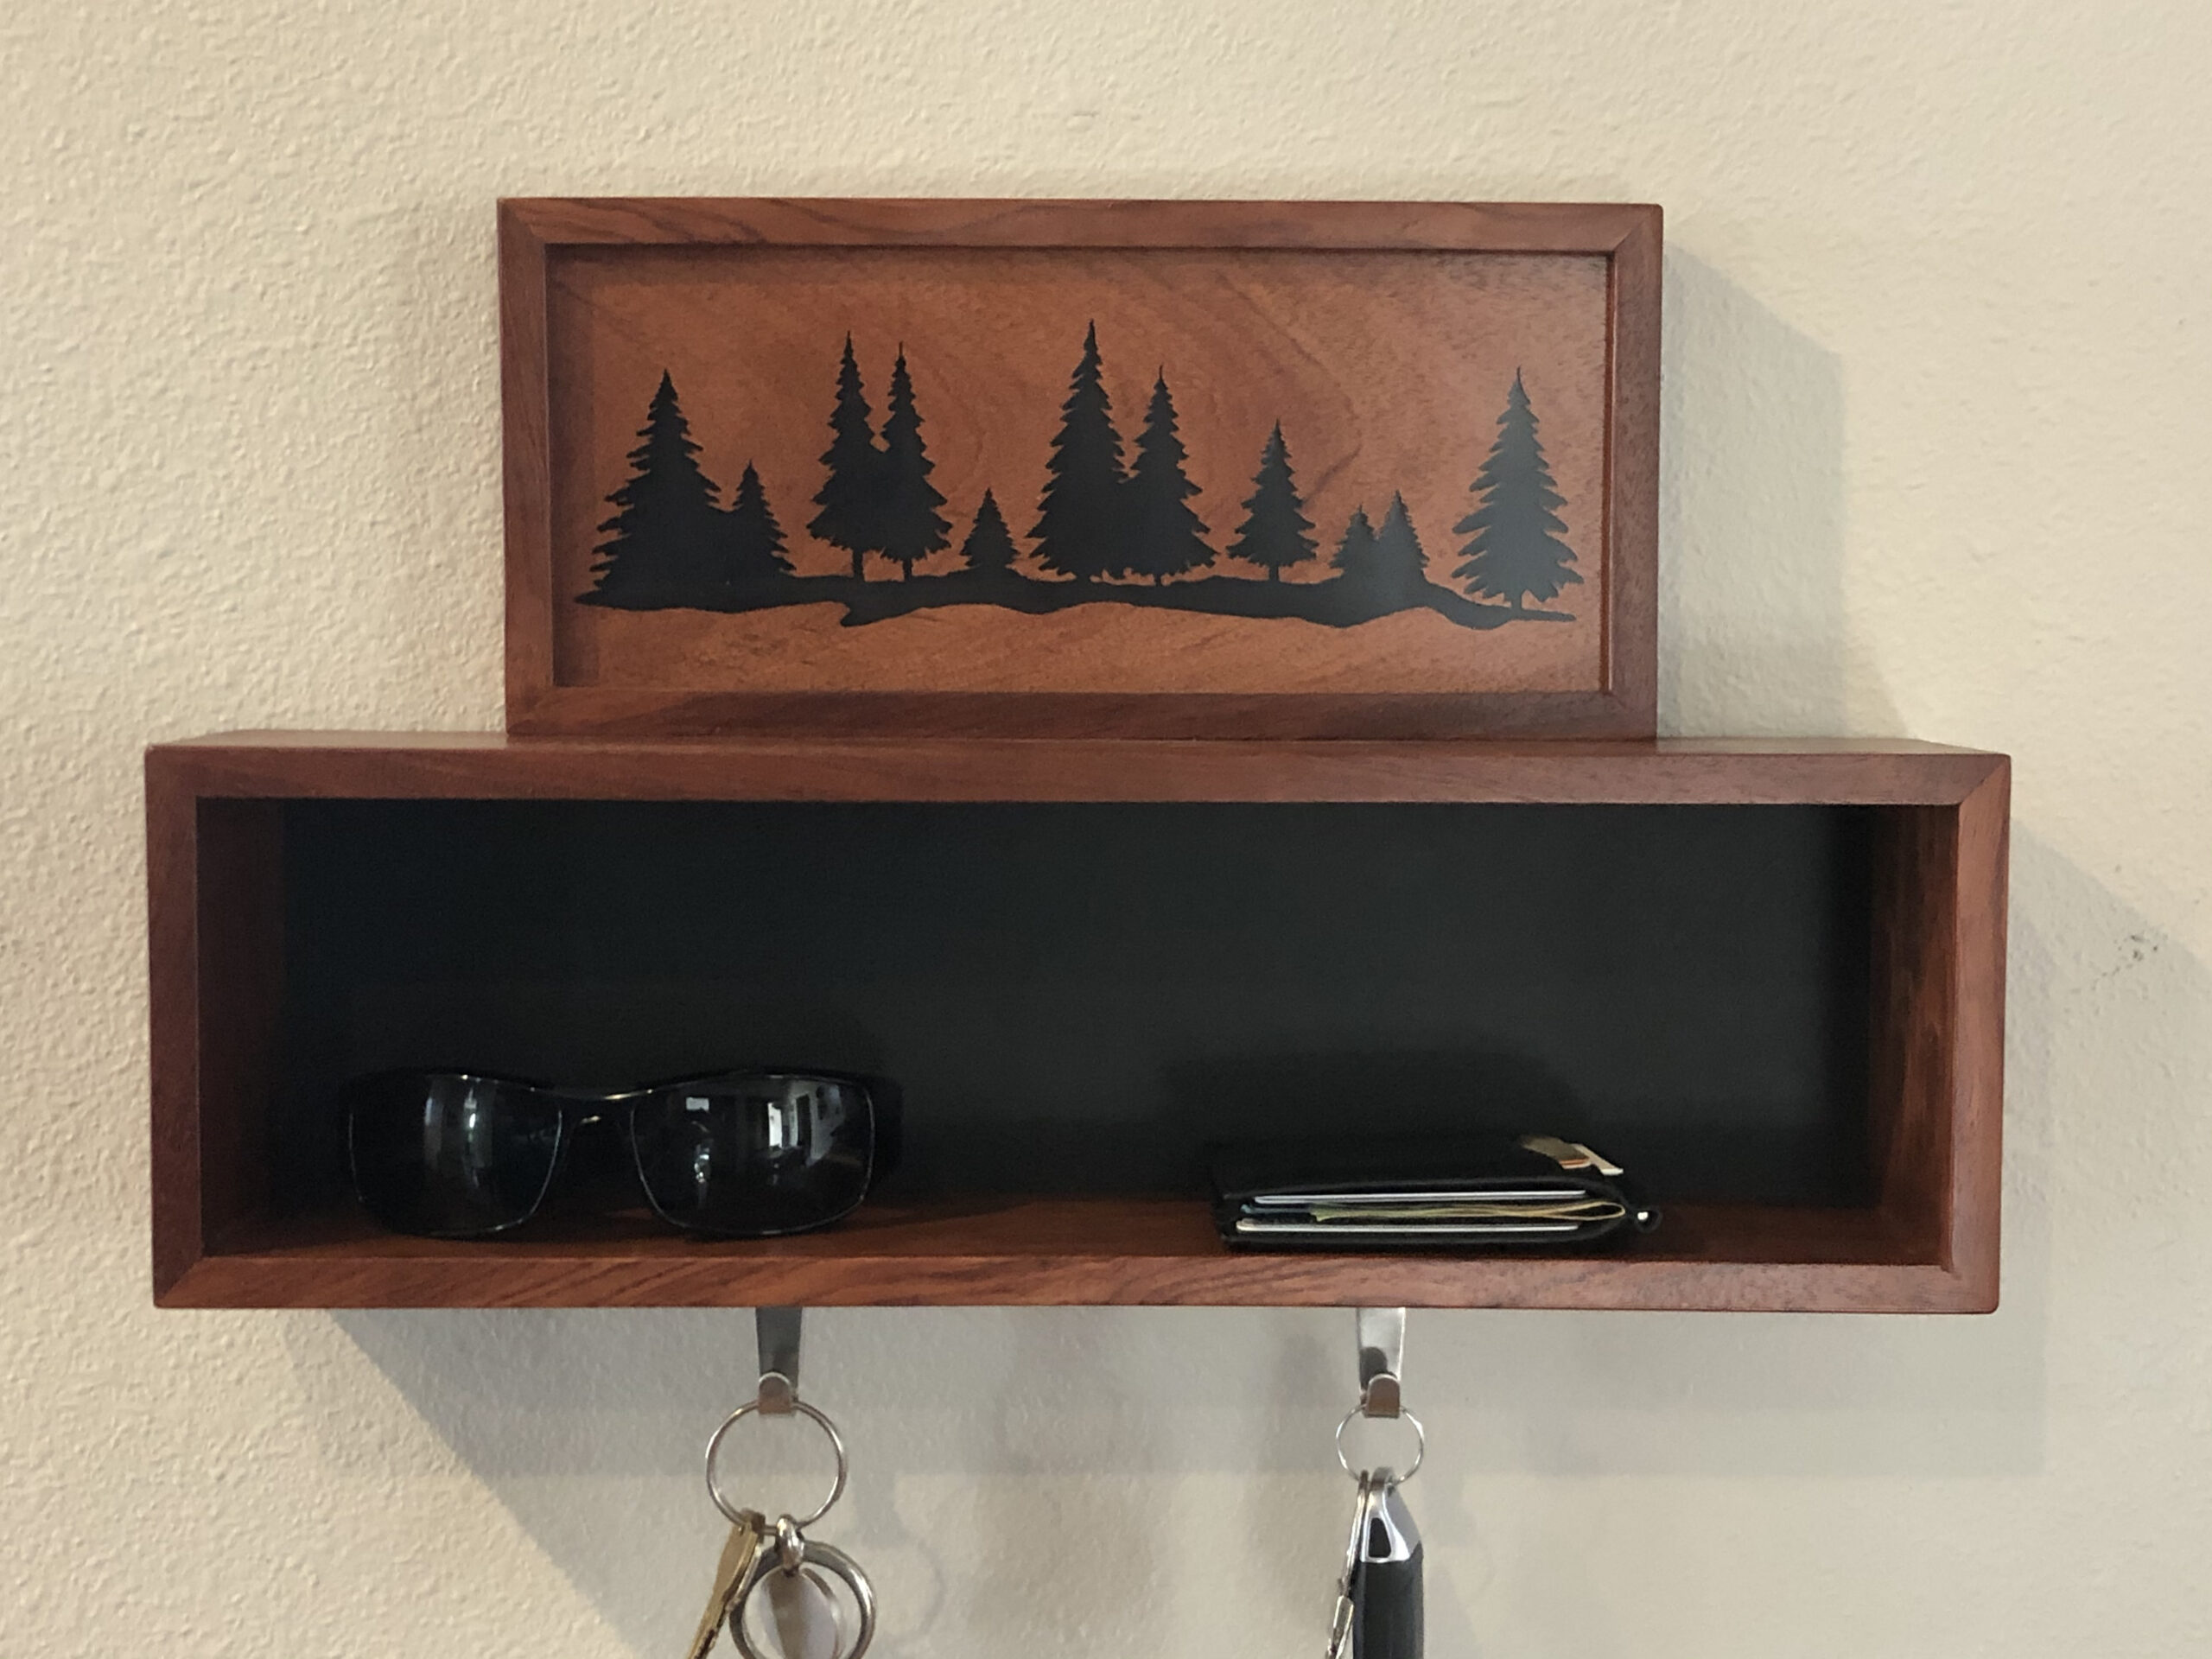 spm-wall-organizer-forest